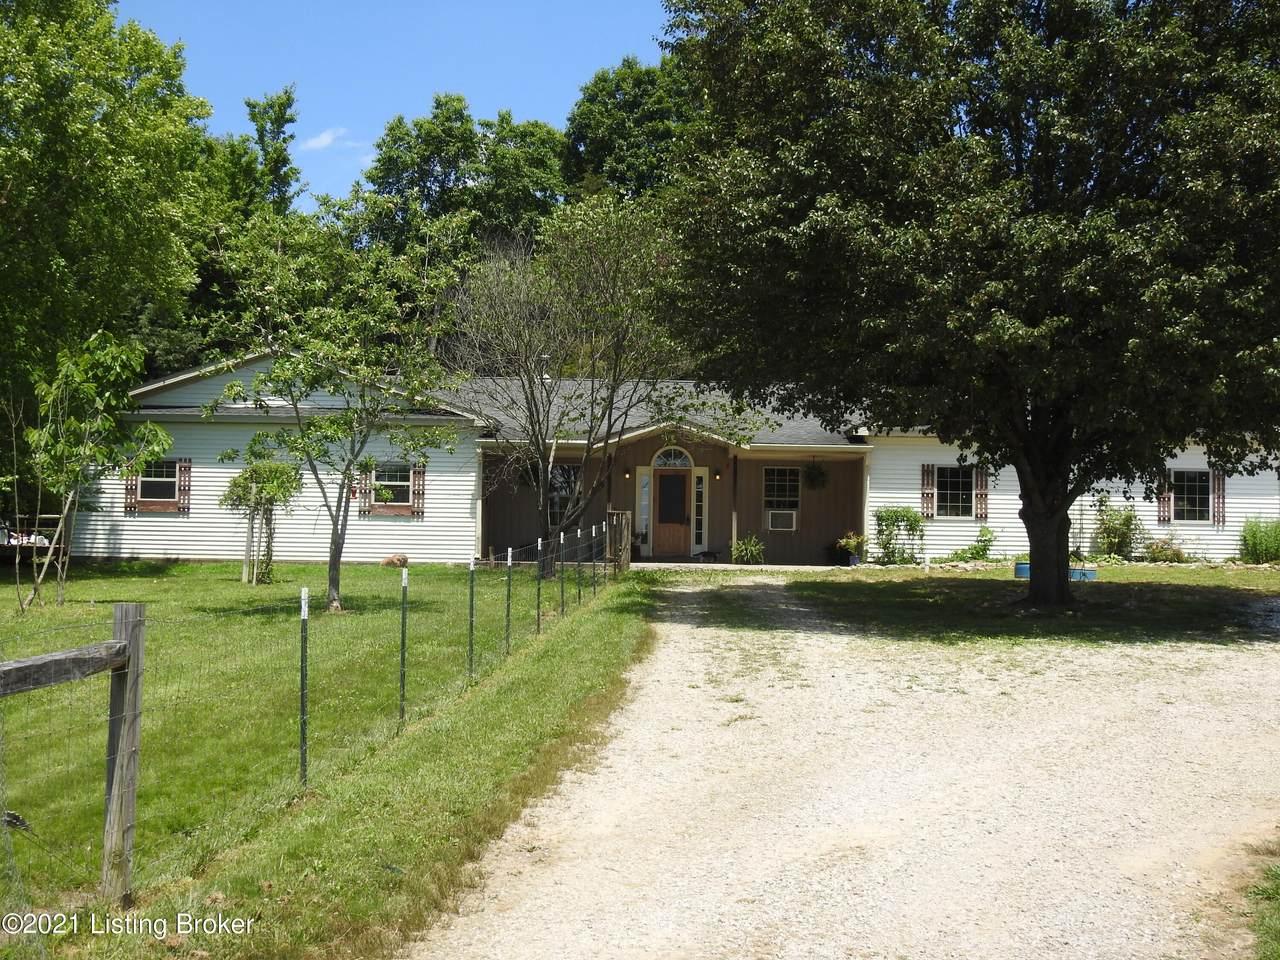 470 Shaw Creek Rd - Photo 1